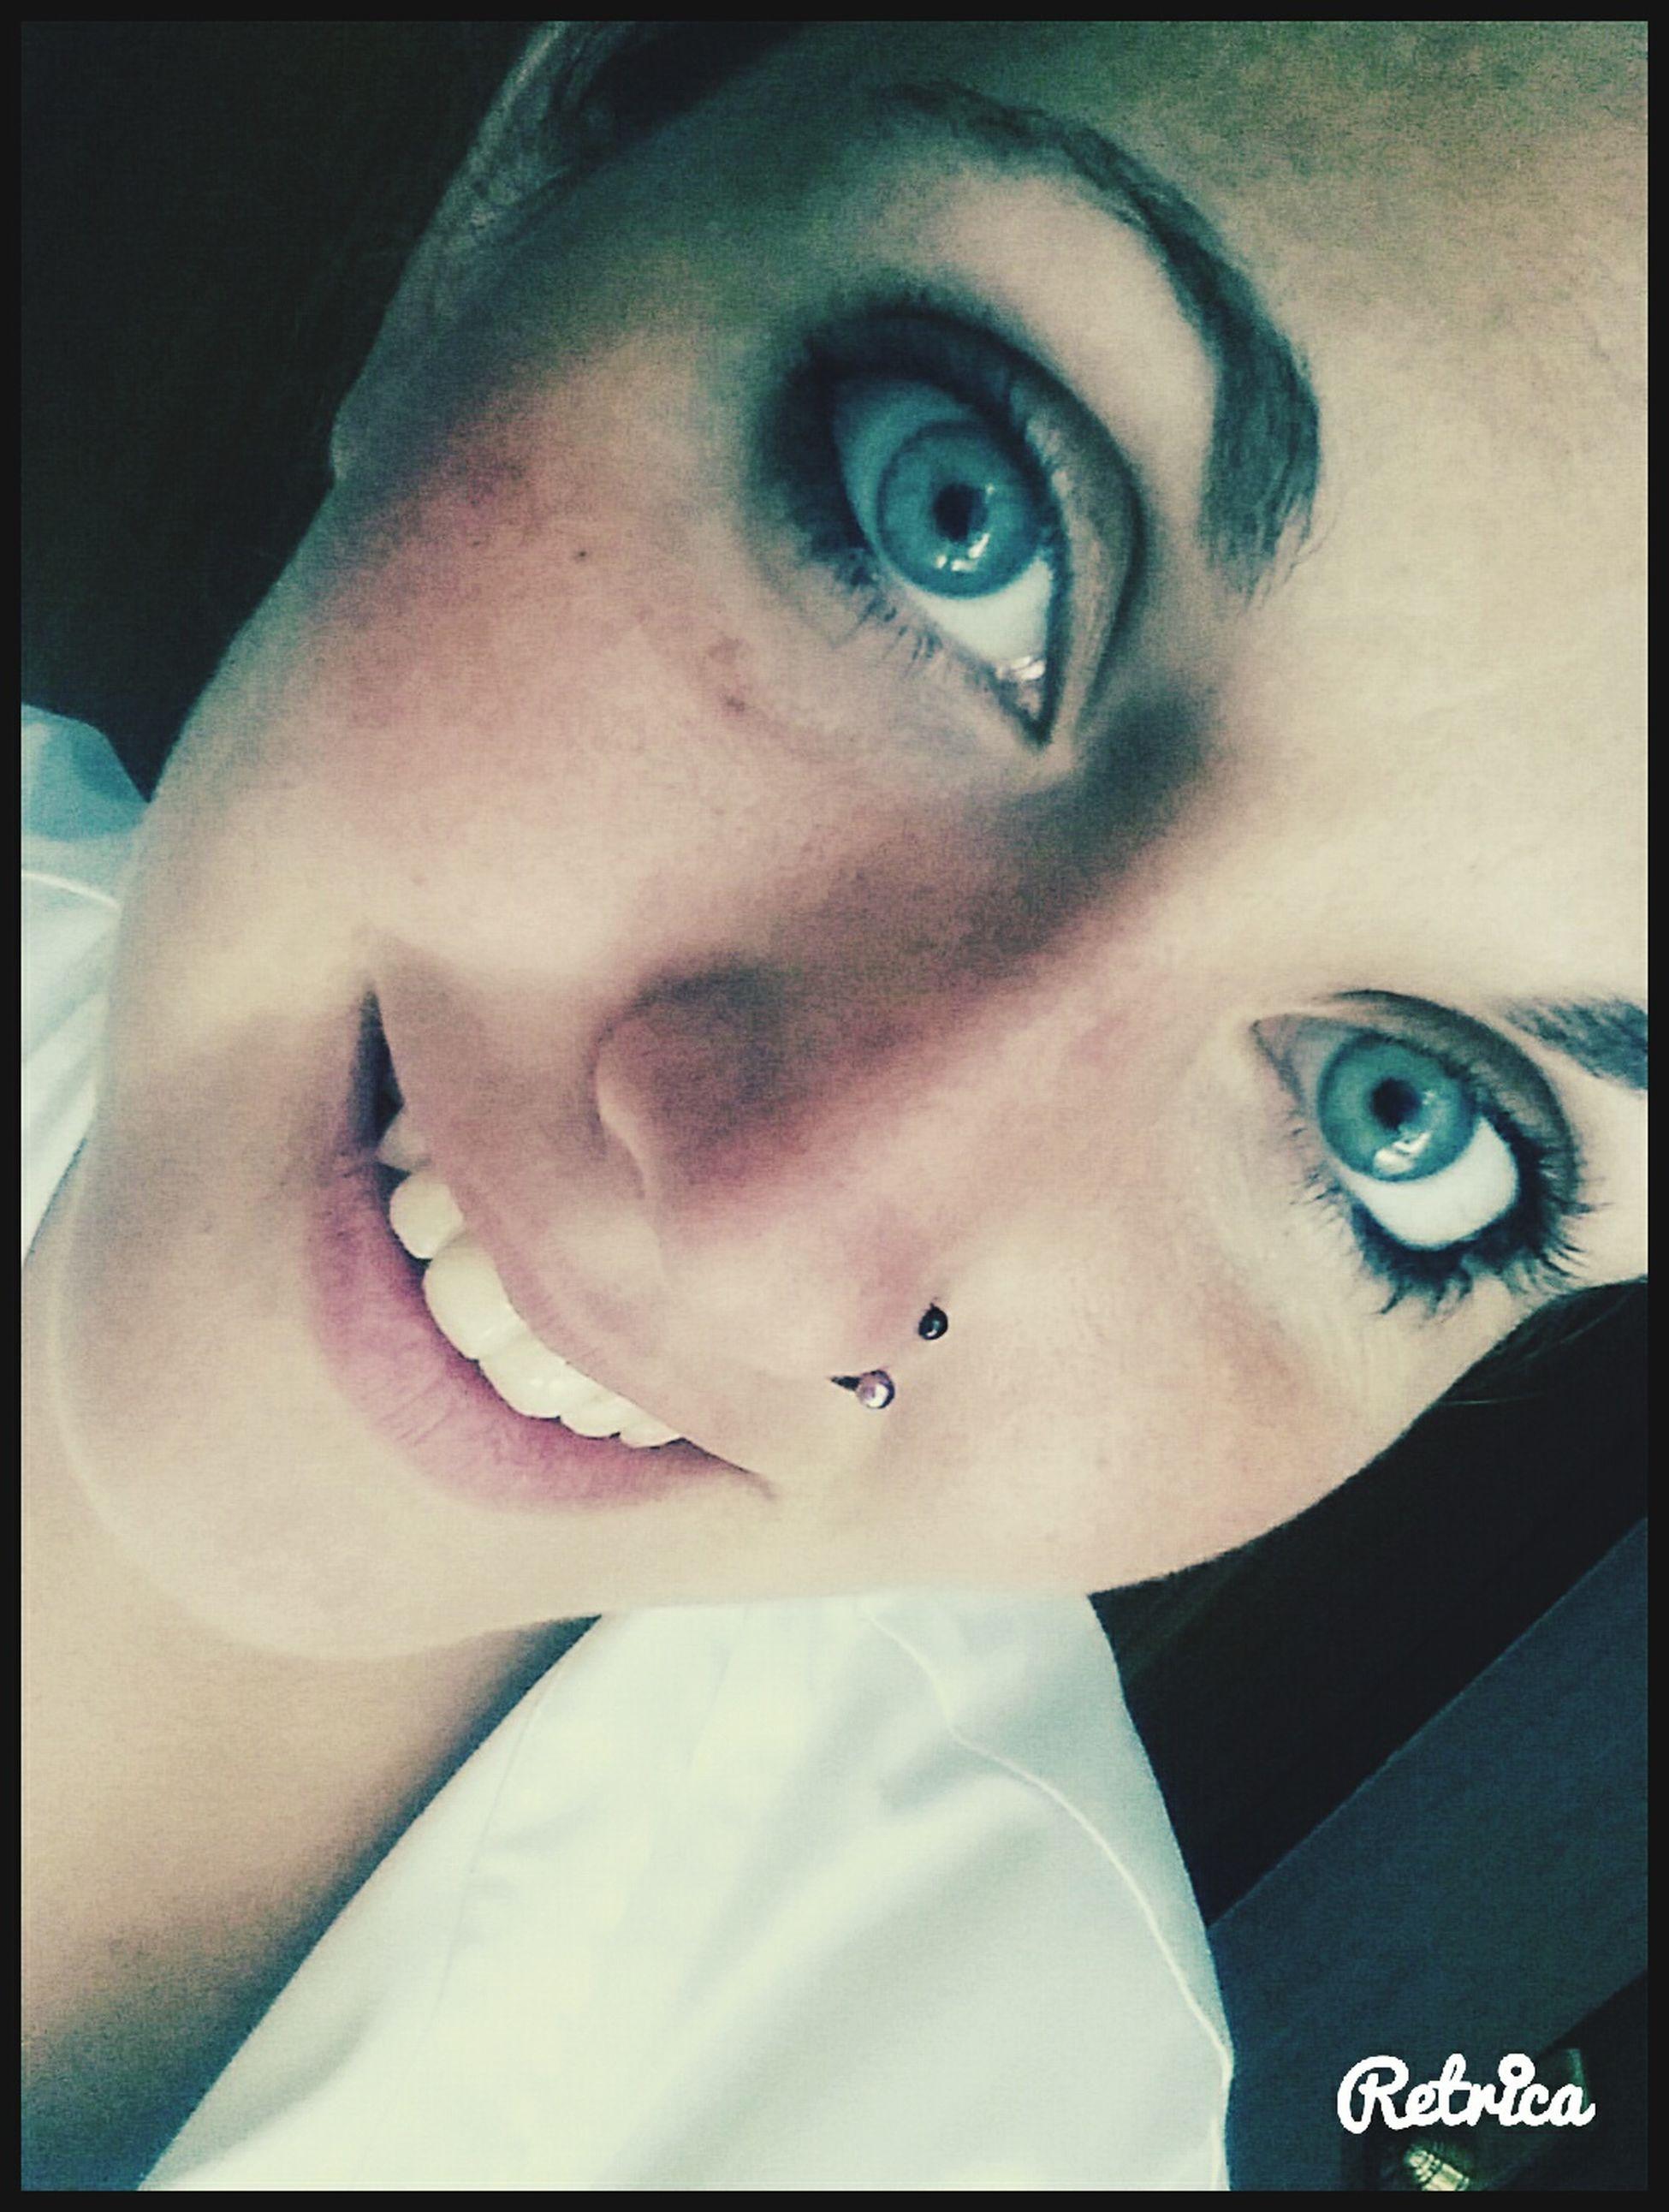 Me😁 Yoysoloyo Eyesblues Summer ☀ Love ♥ Smile ✌ Me❤